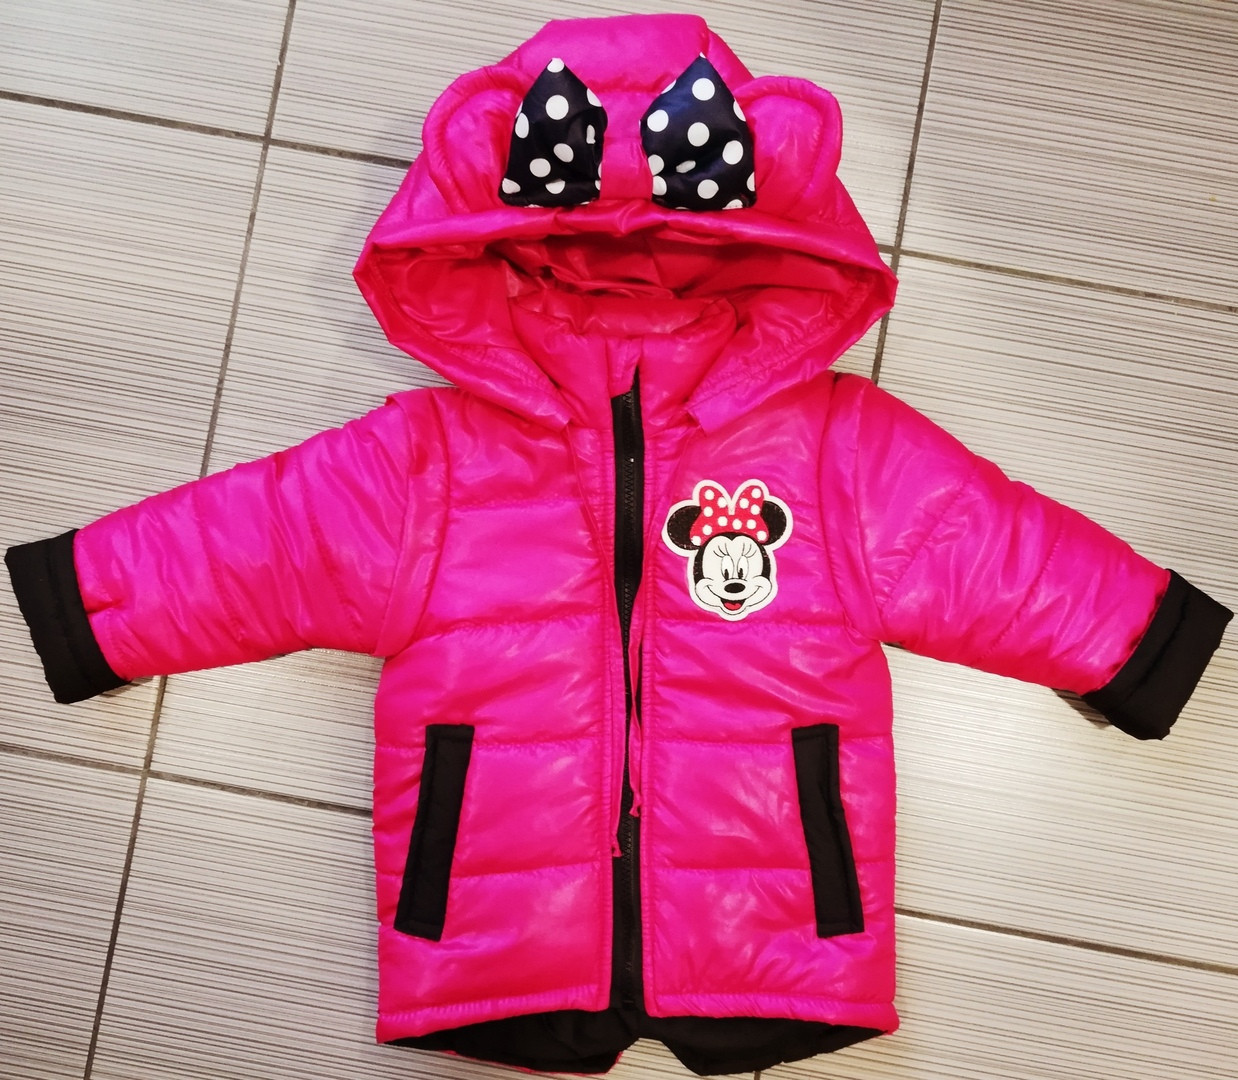 Легкую куртку жилетку на девочку с Микки Маусом яркую